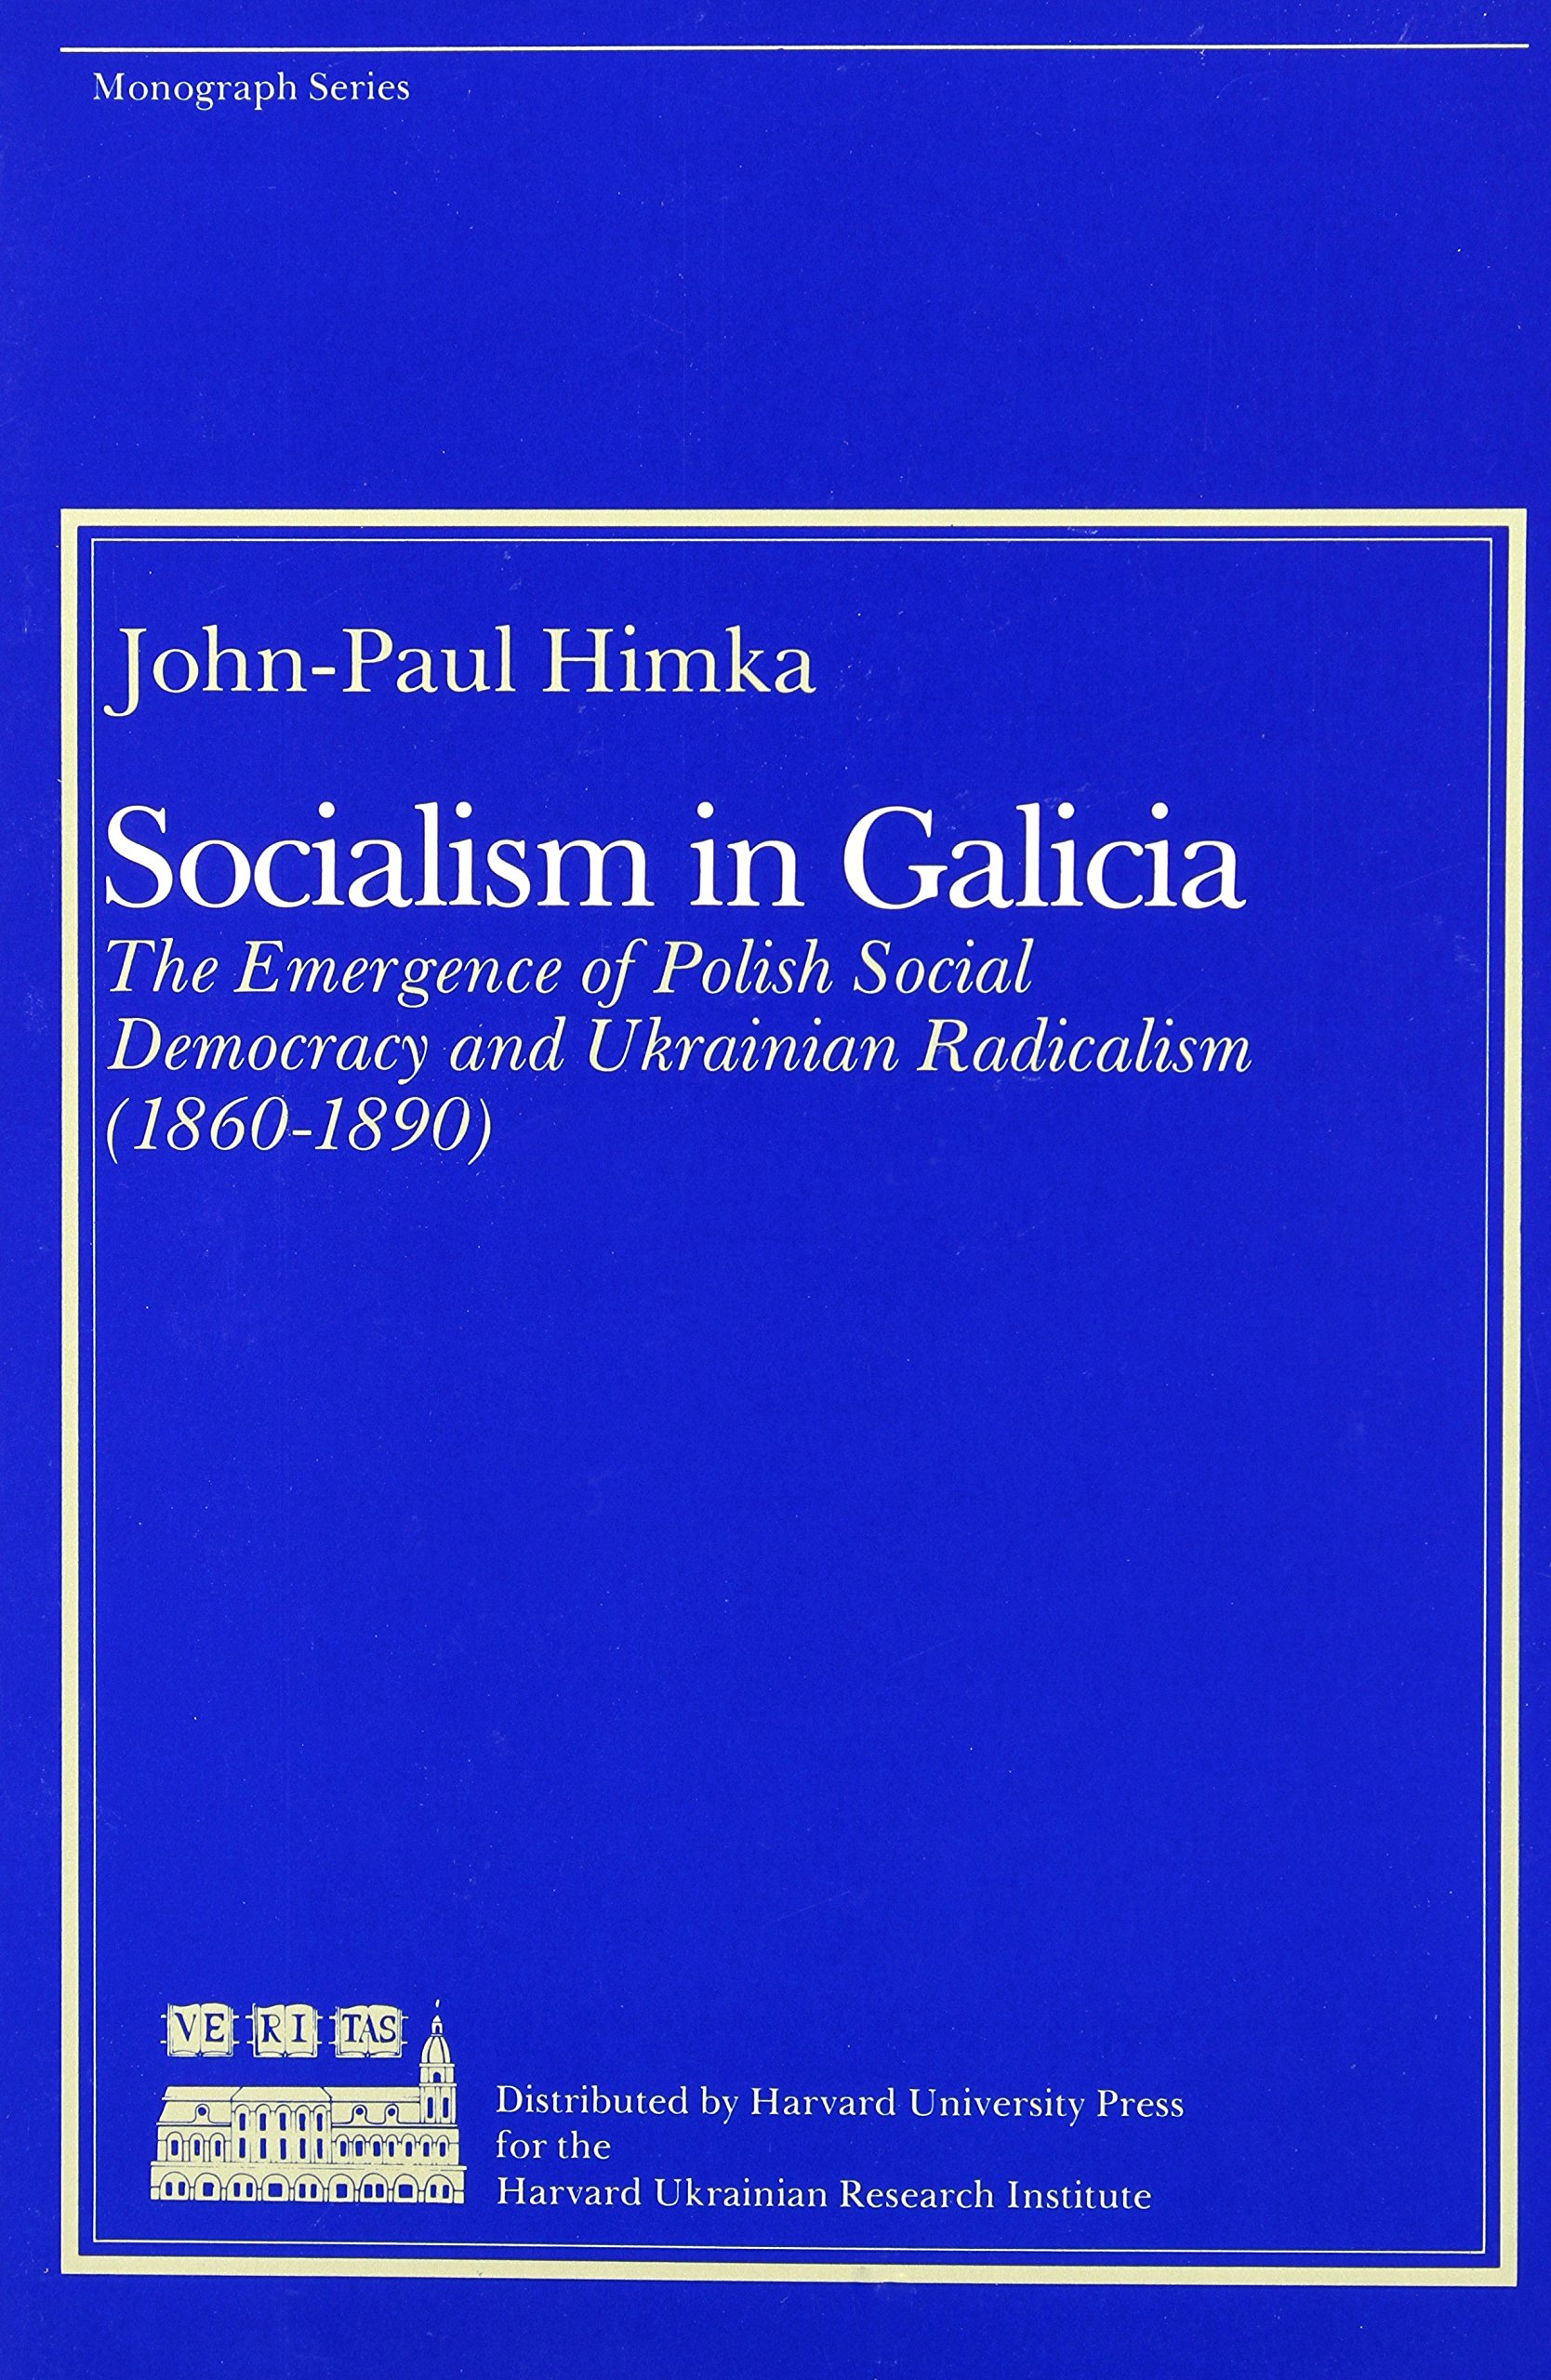 Socialism In Galicia   The Emergence Of Polish Social Democracy And Ukrainian Radicalism  MONOGRAPH SERIES  HARVARD UKRAINIAN RESEARCH INSTITUTE